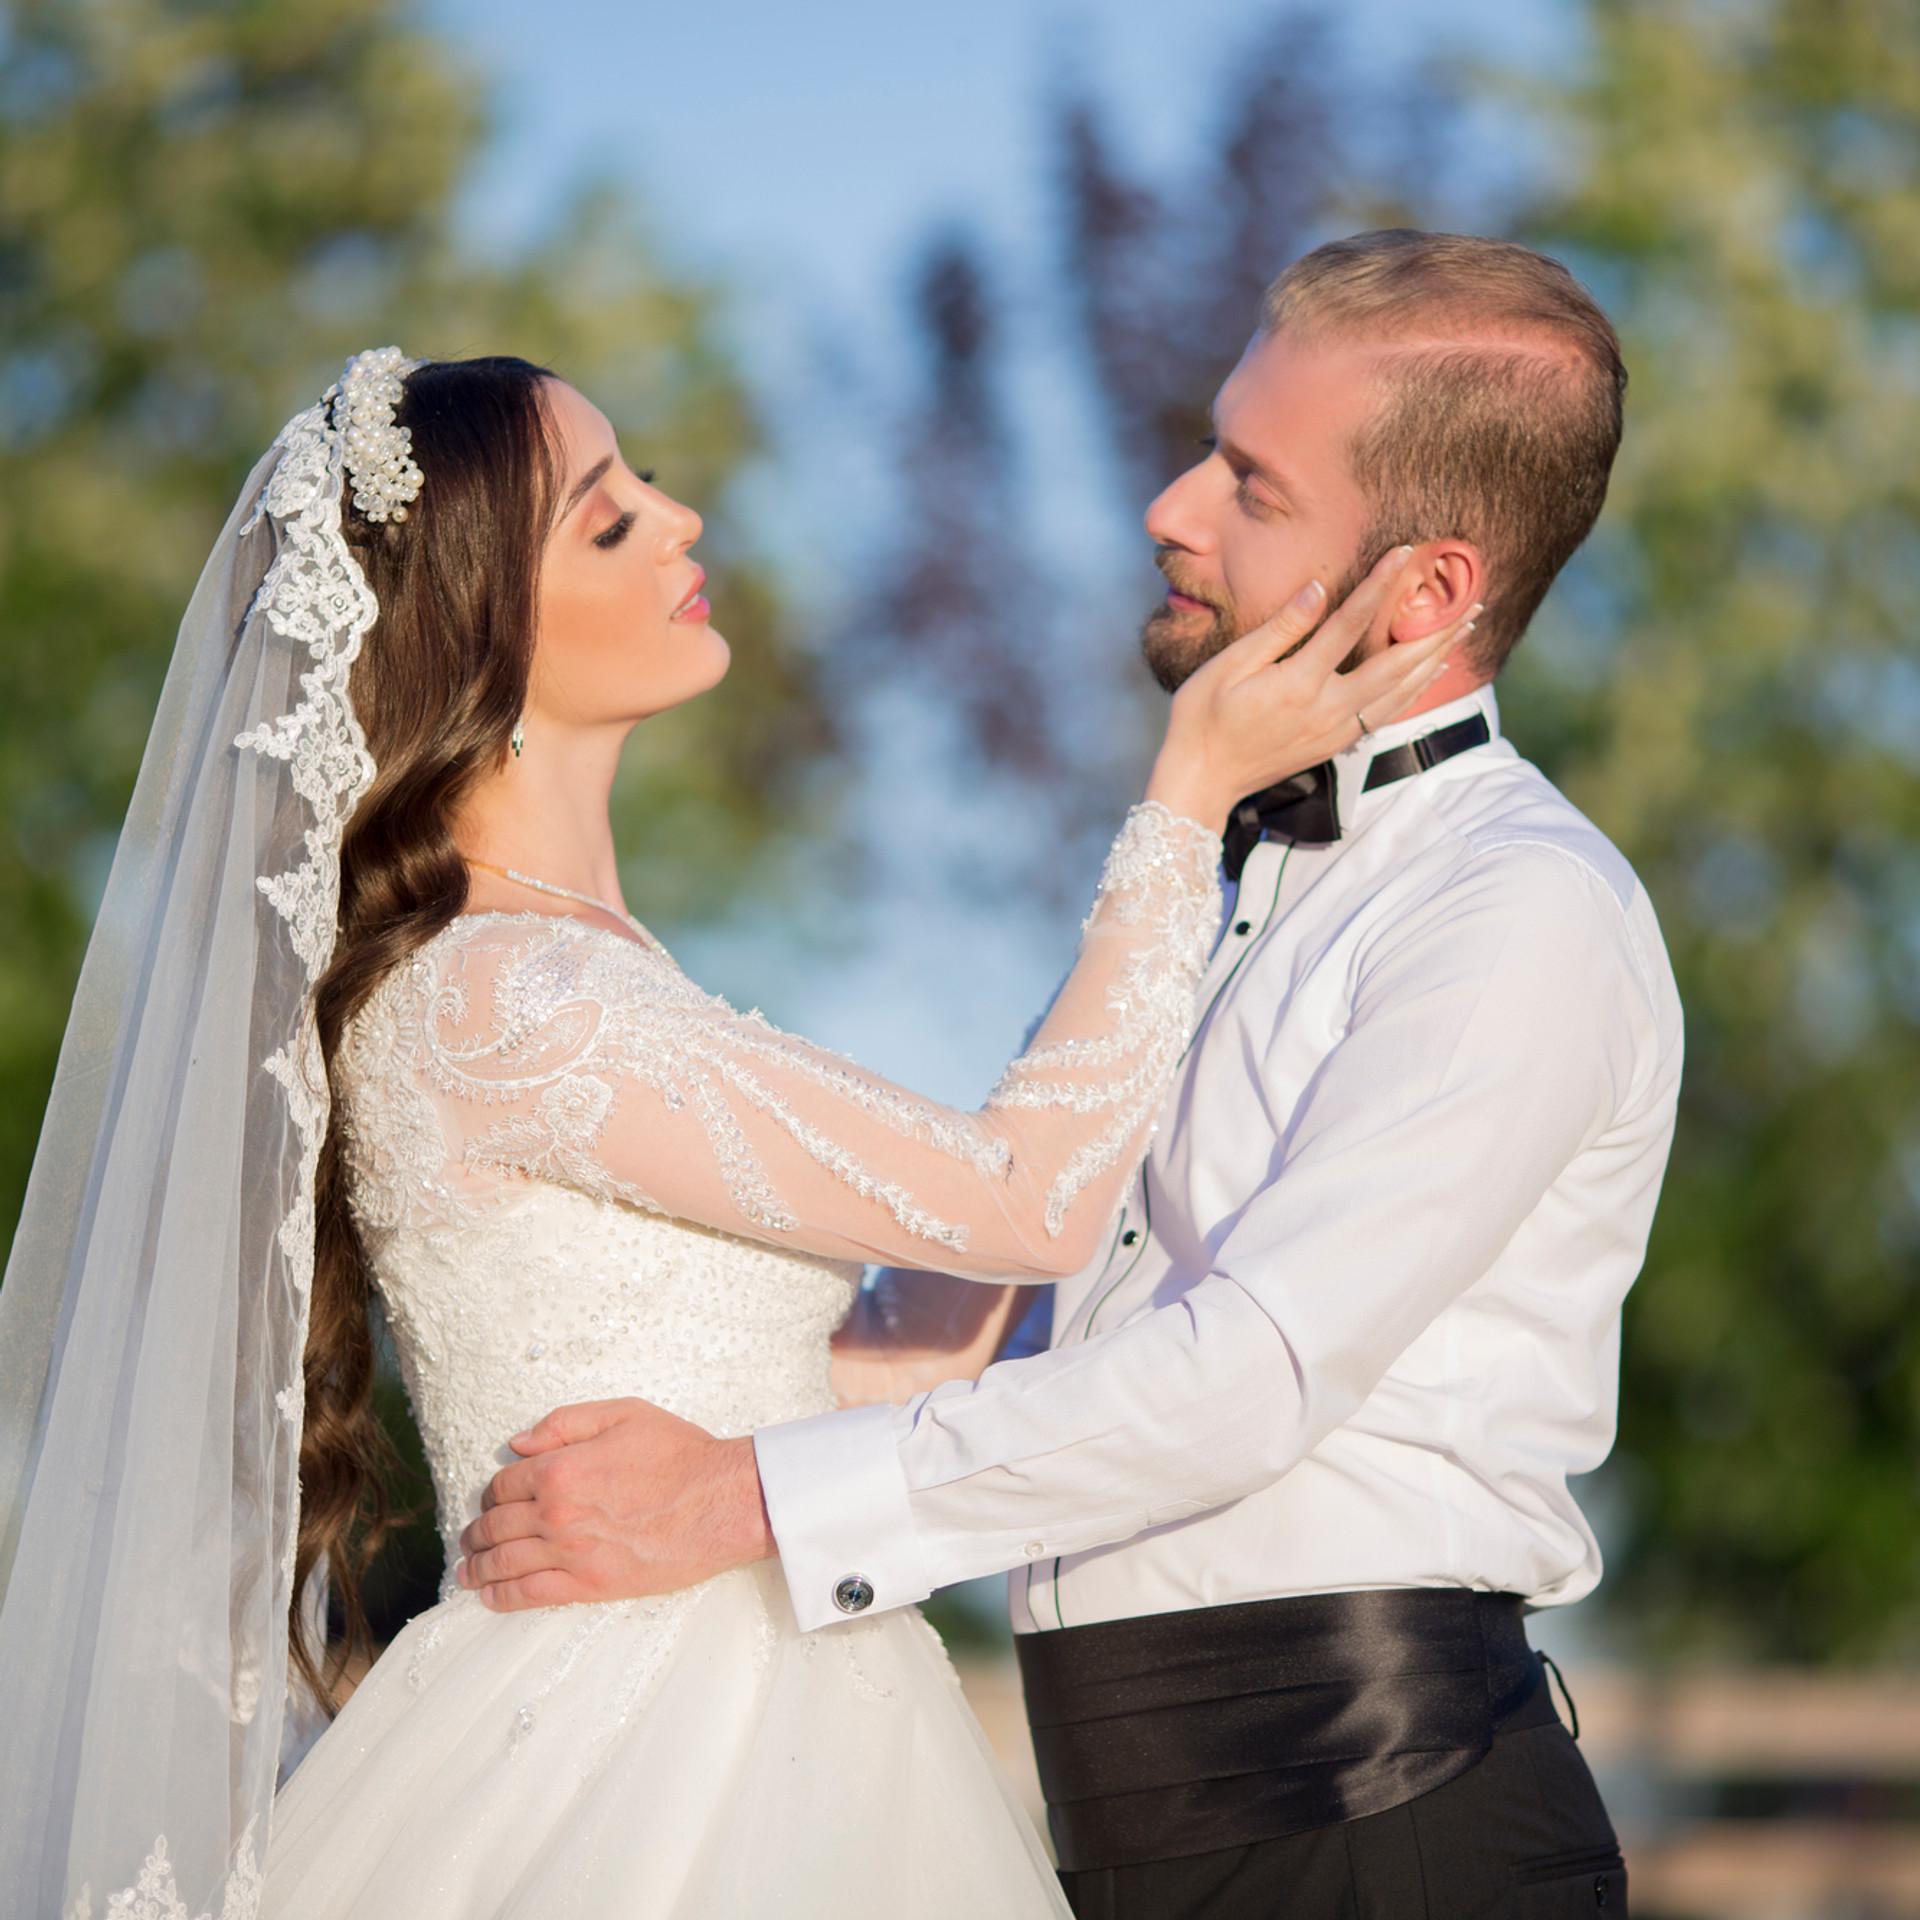 konya fotoğrafçı,konya düğün fotoğrafçıs